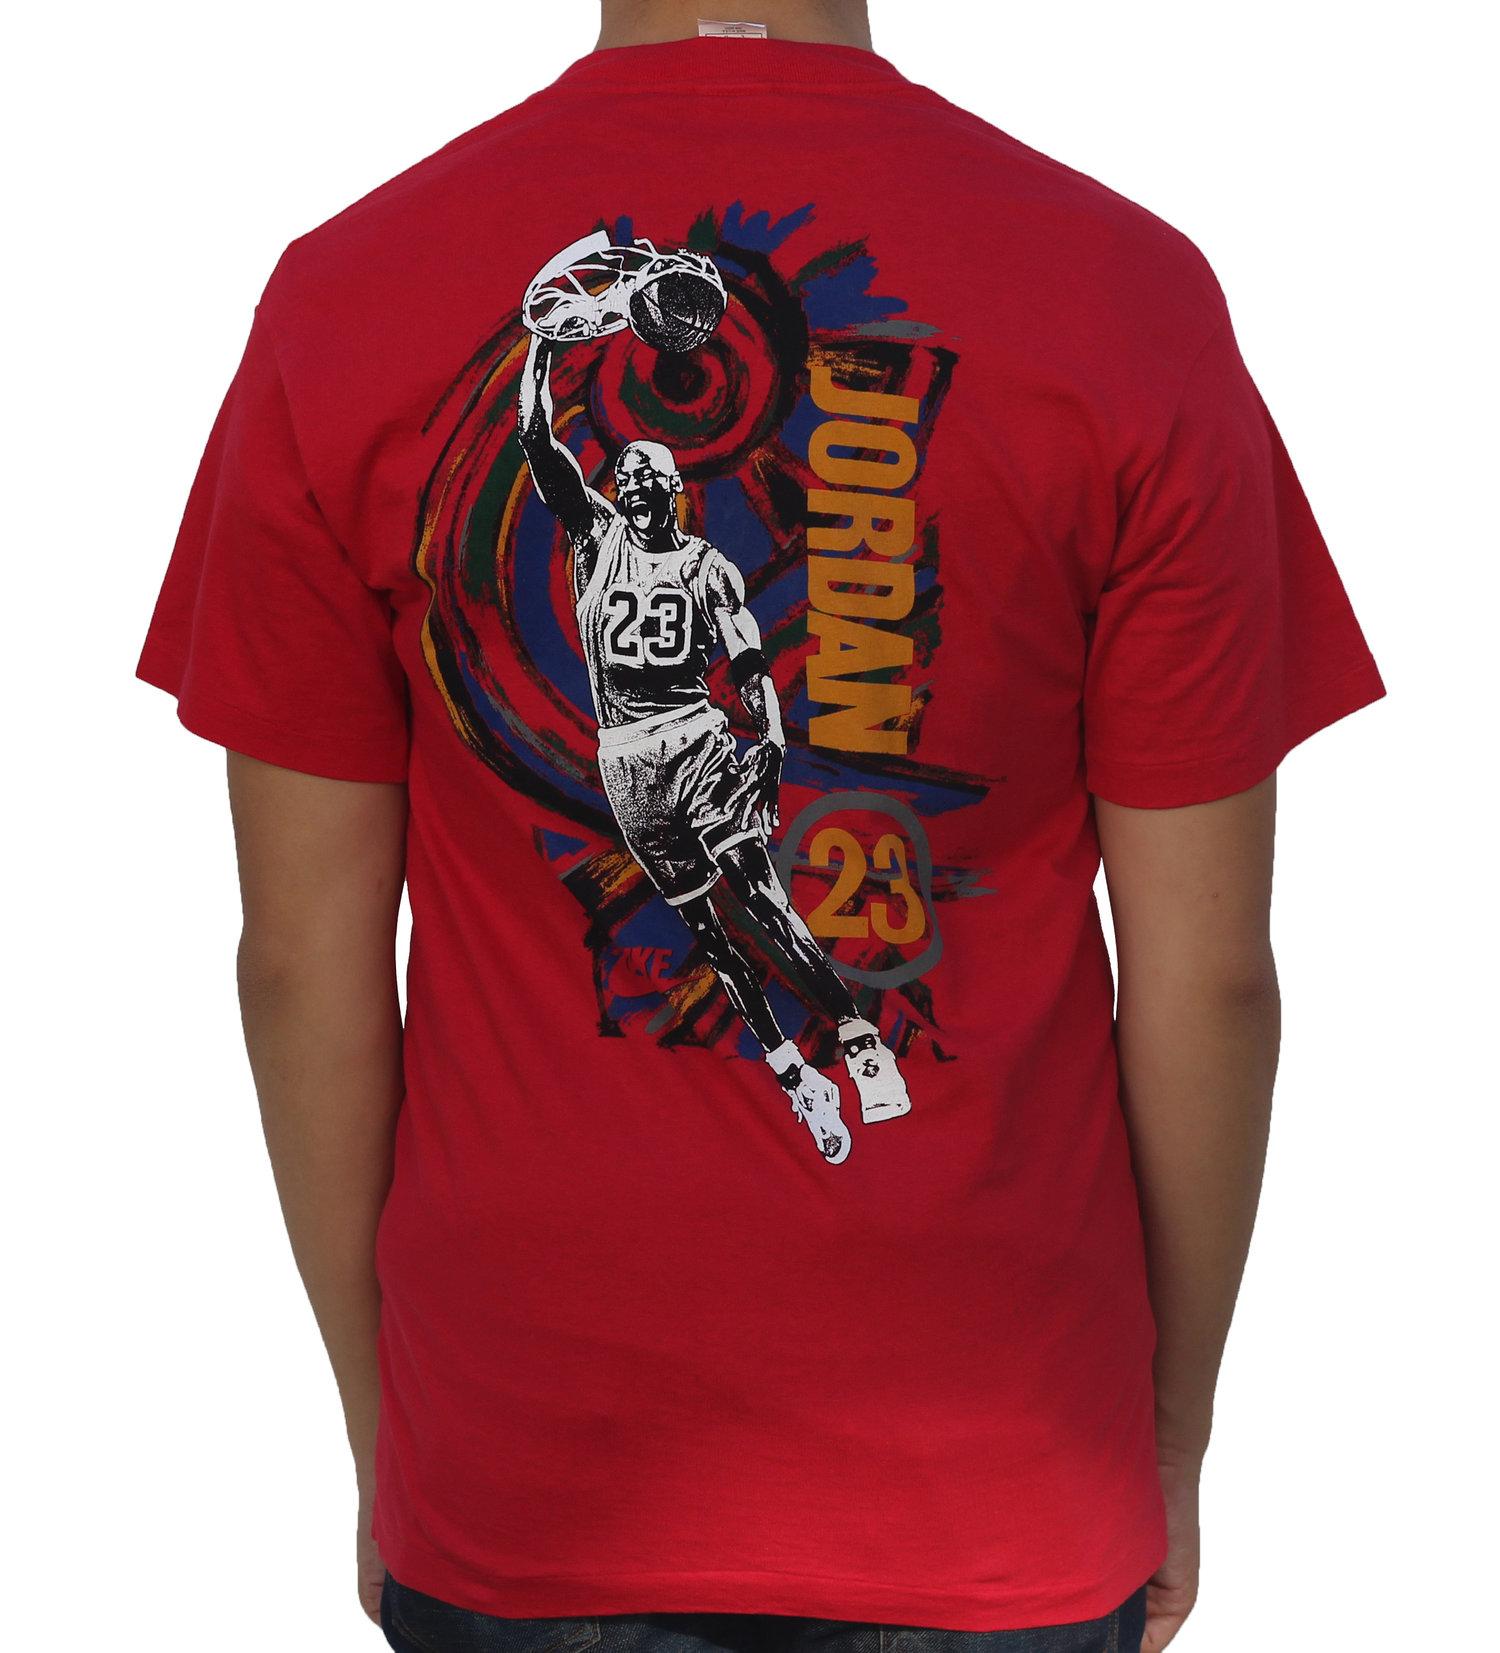 competitive price 6137e 8ffce Vintage Nike Air Jordan VI 6 Carmine OG Dunking T Shirt (Size L) — Roots